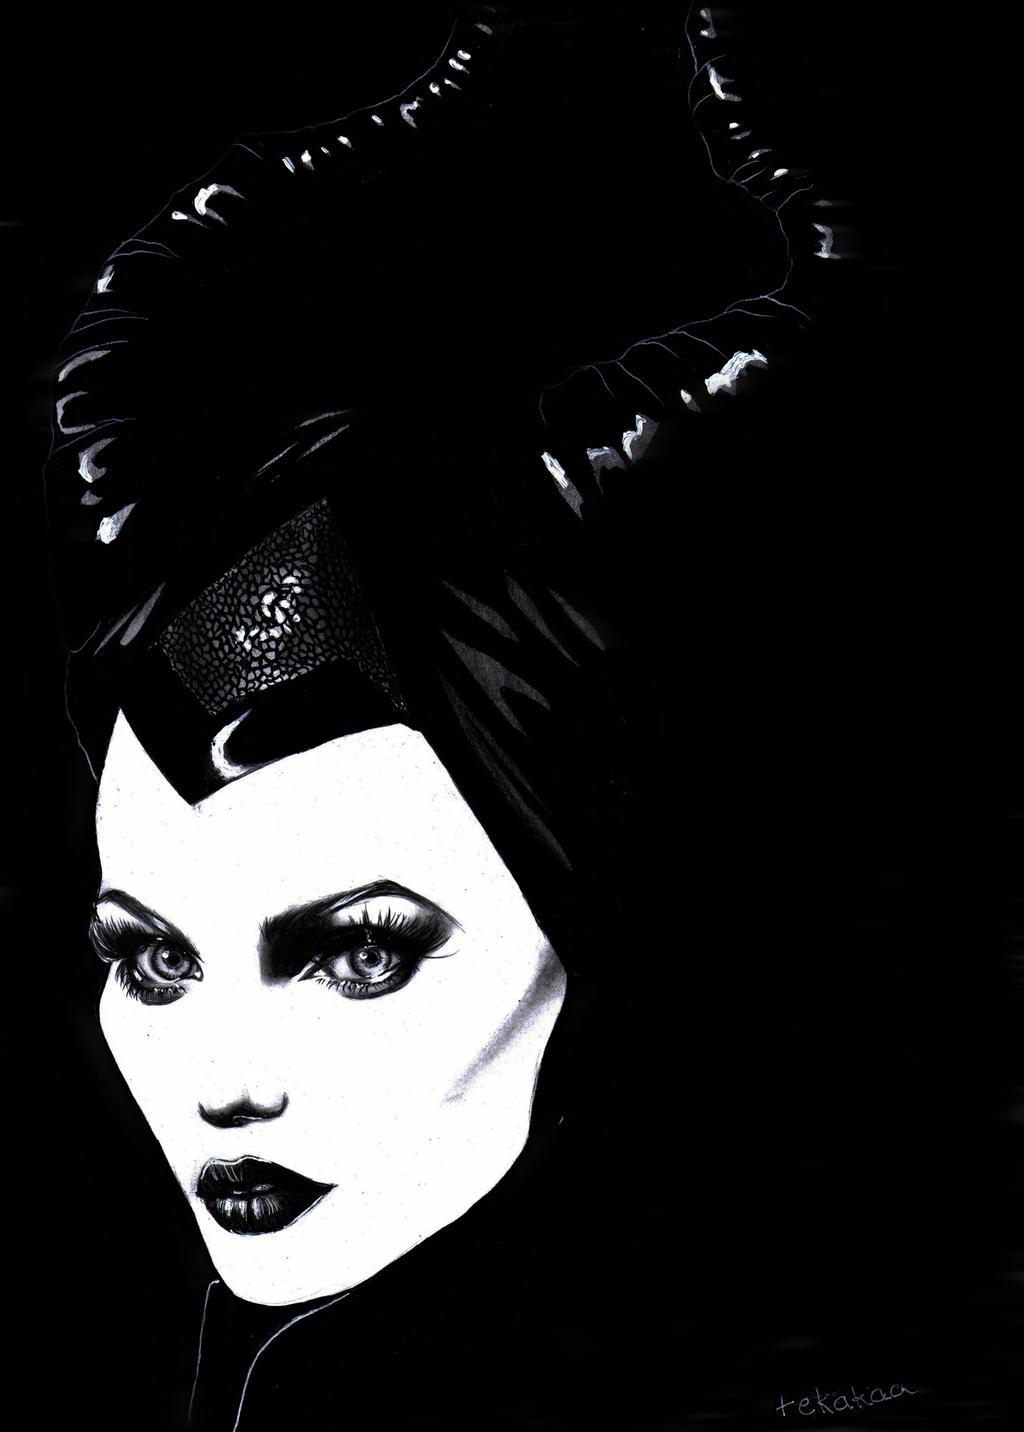 (Pencil drawing) Maleficent by LinaKaye